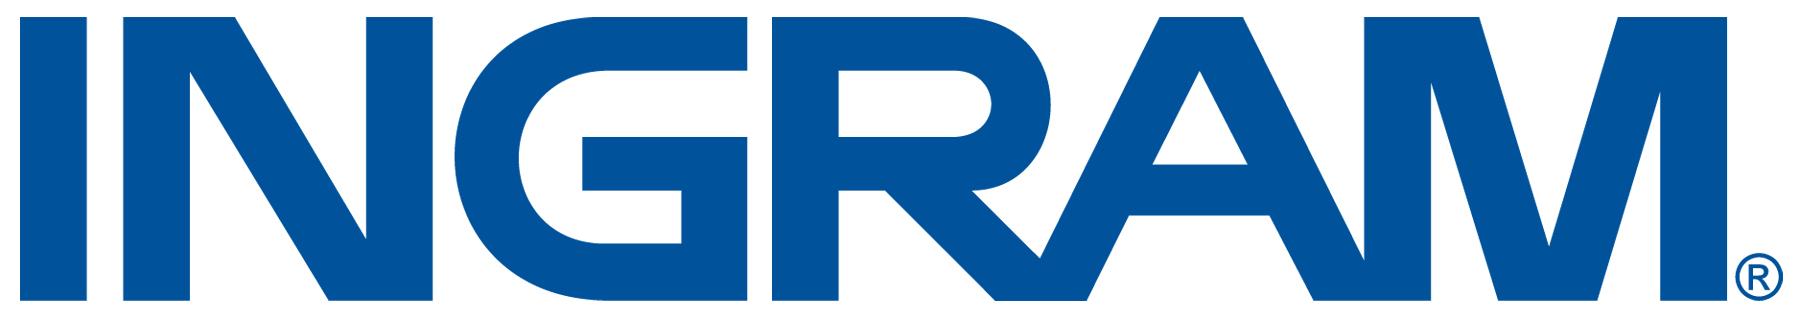 Ingram_logo.jpg